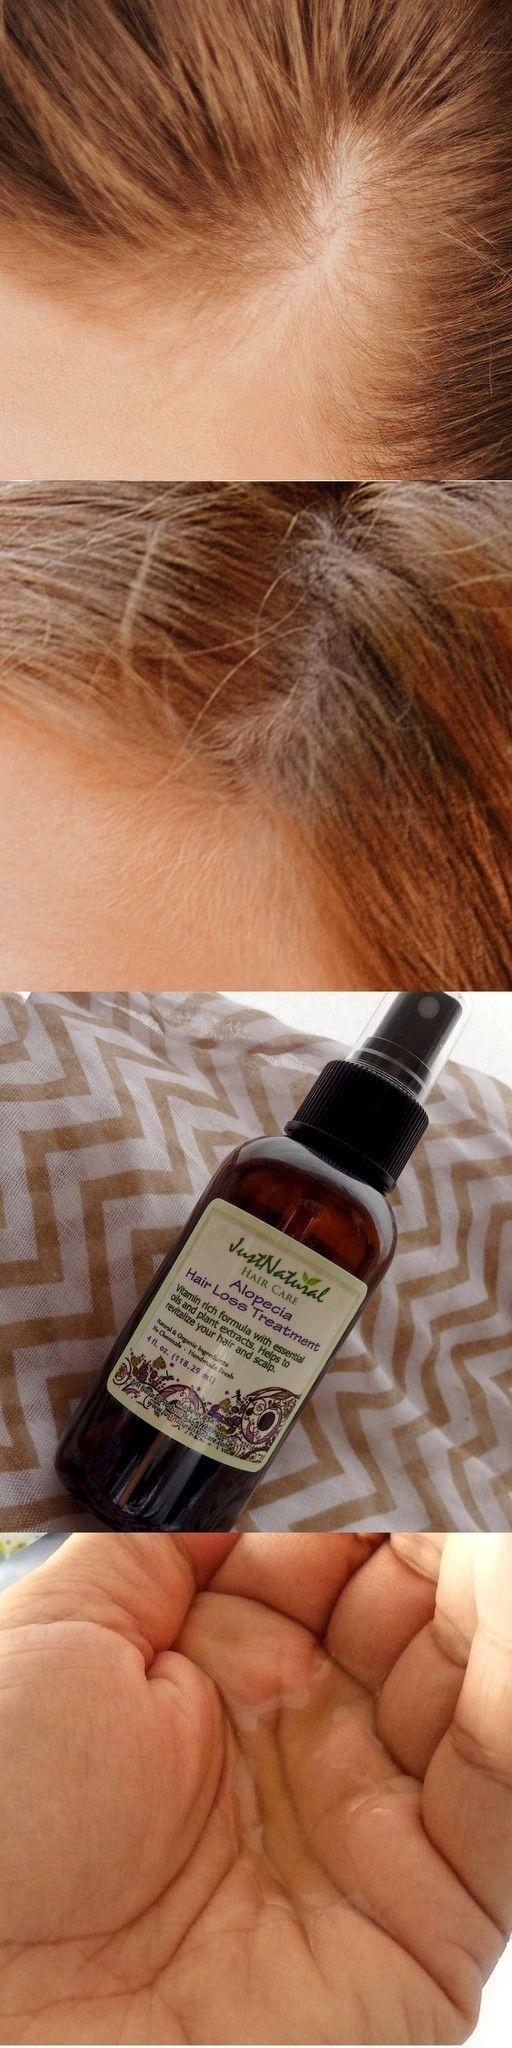 Alopecia Hair Loss Treatment http://www.hairgrowinggenius.com/